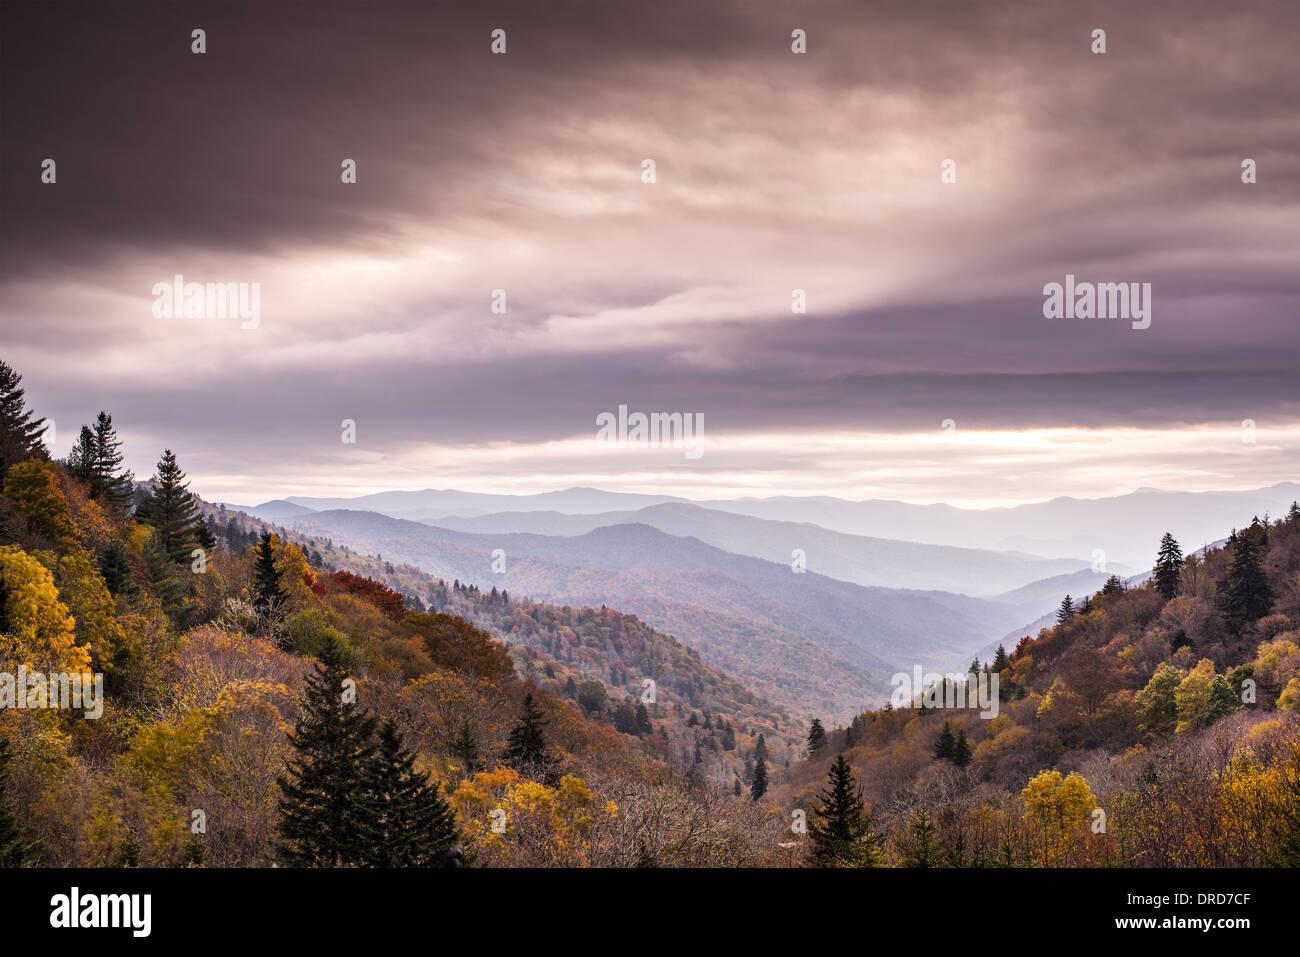 Smoky Mountains National Park en una nublada mañana de otoño. Imagen De Stock